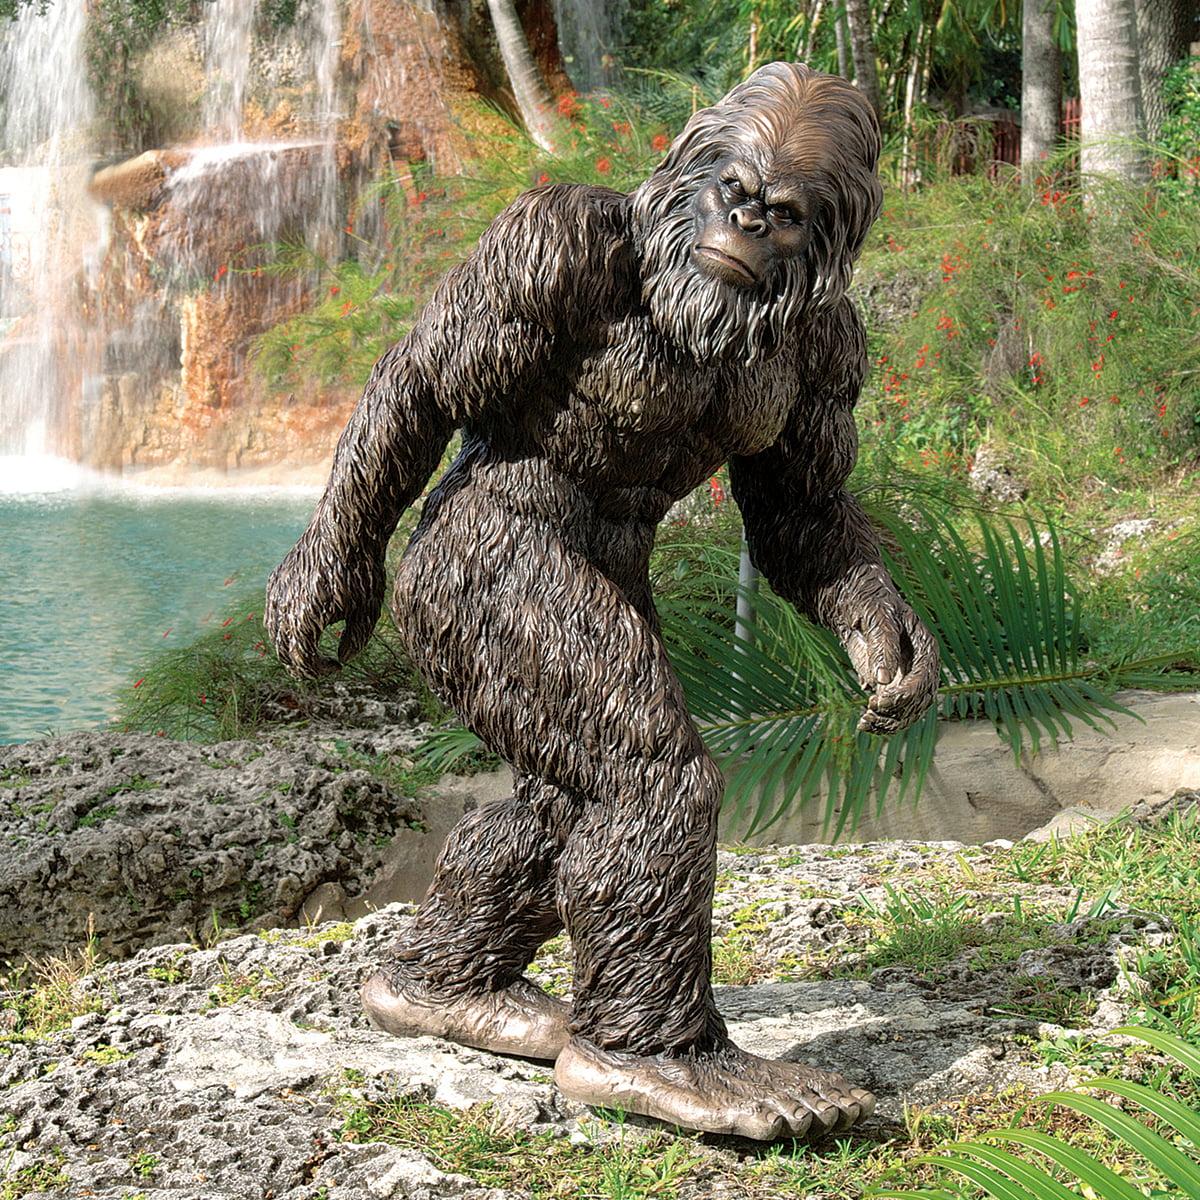 Design Toscano Bigfoot, the Garden Yeti Statue: Medium by Design Toscano